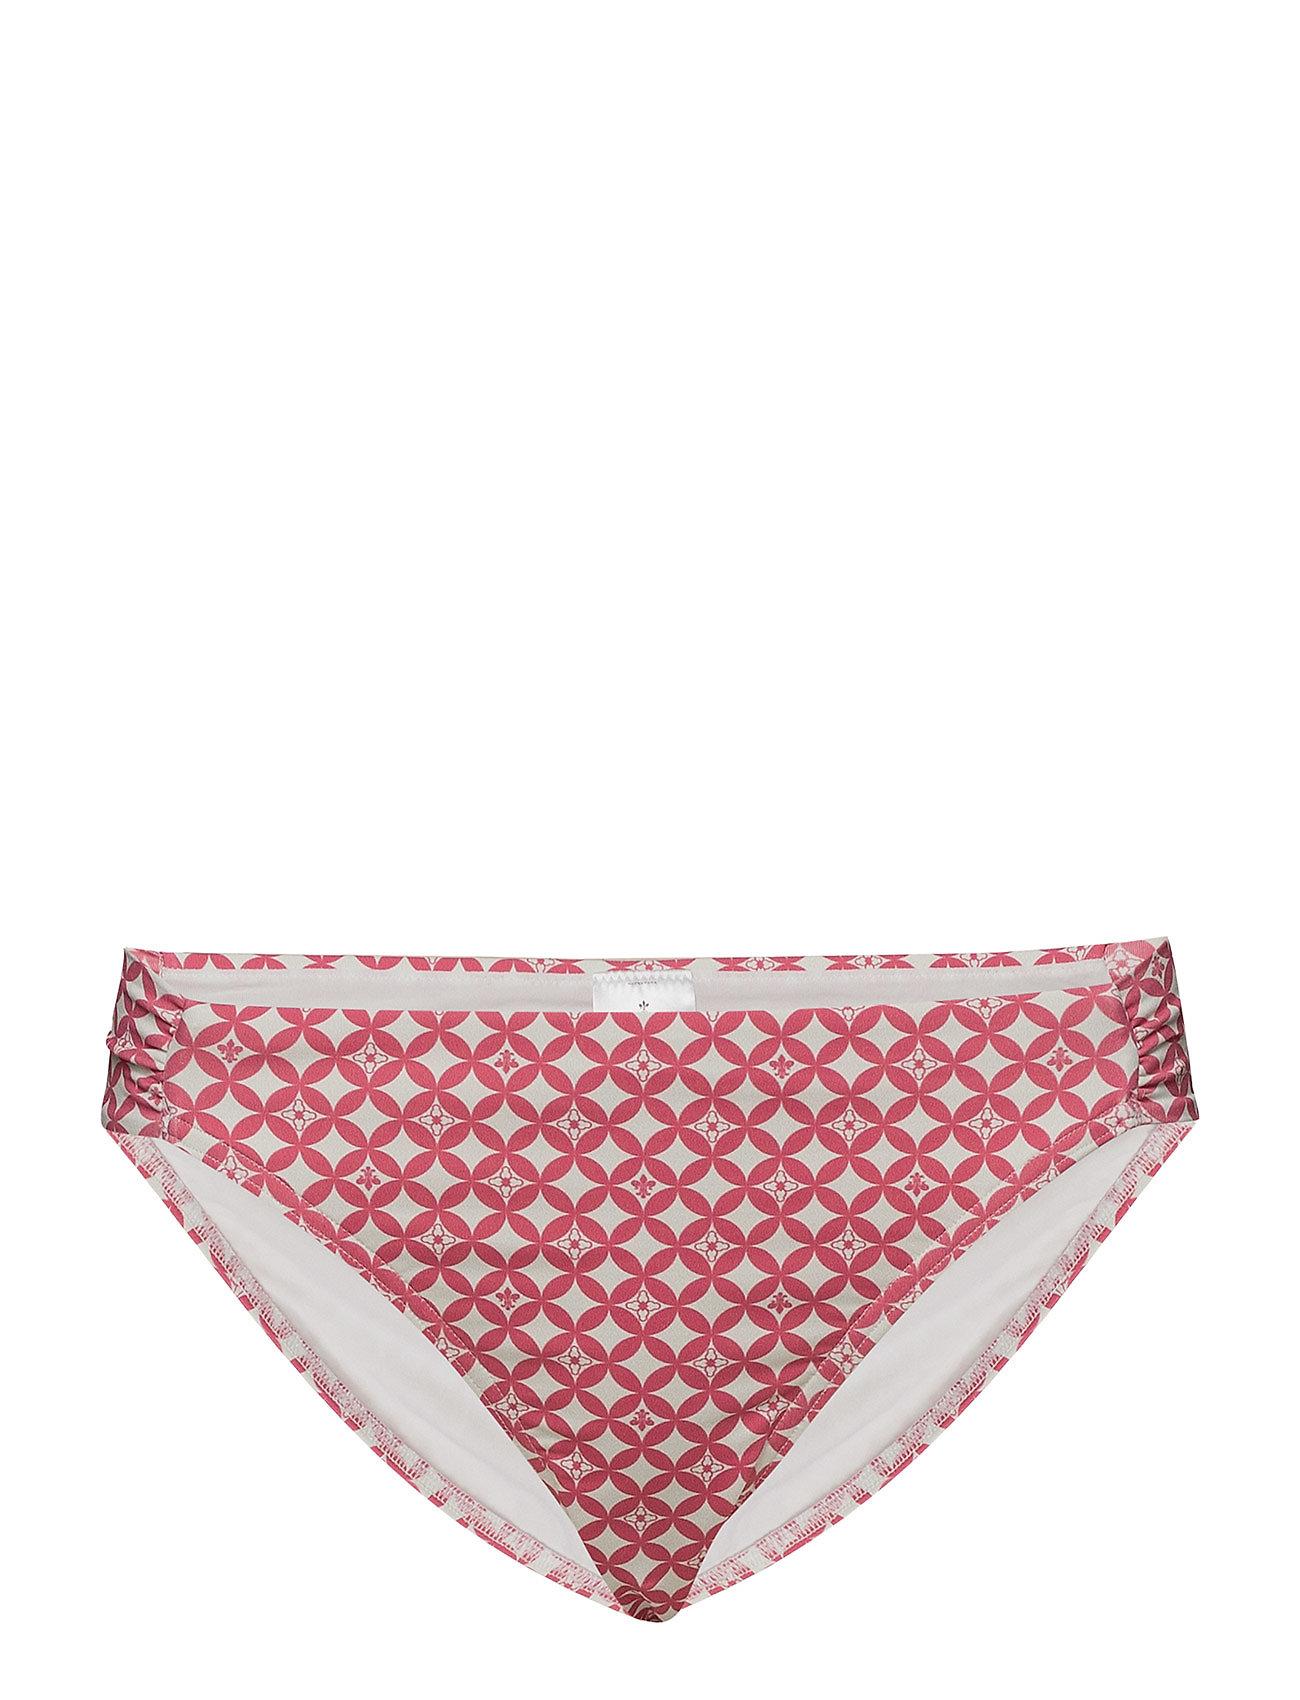 Morris Lady Elaine Pattern Bikini Bottom - CERISE